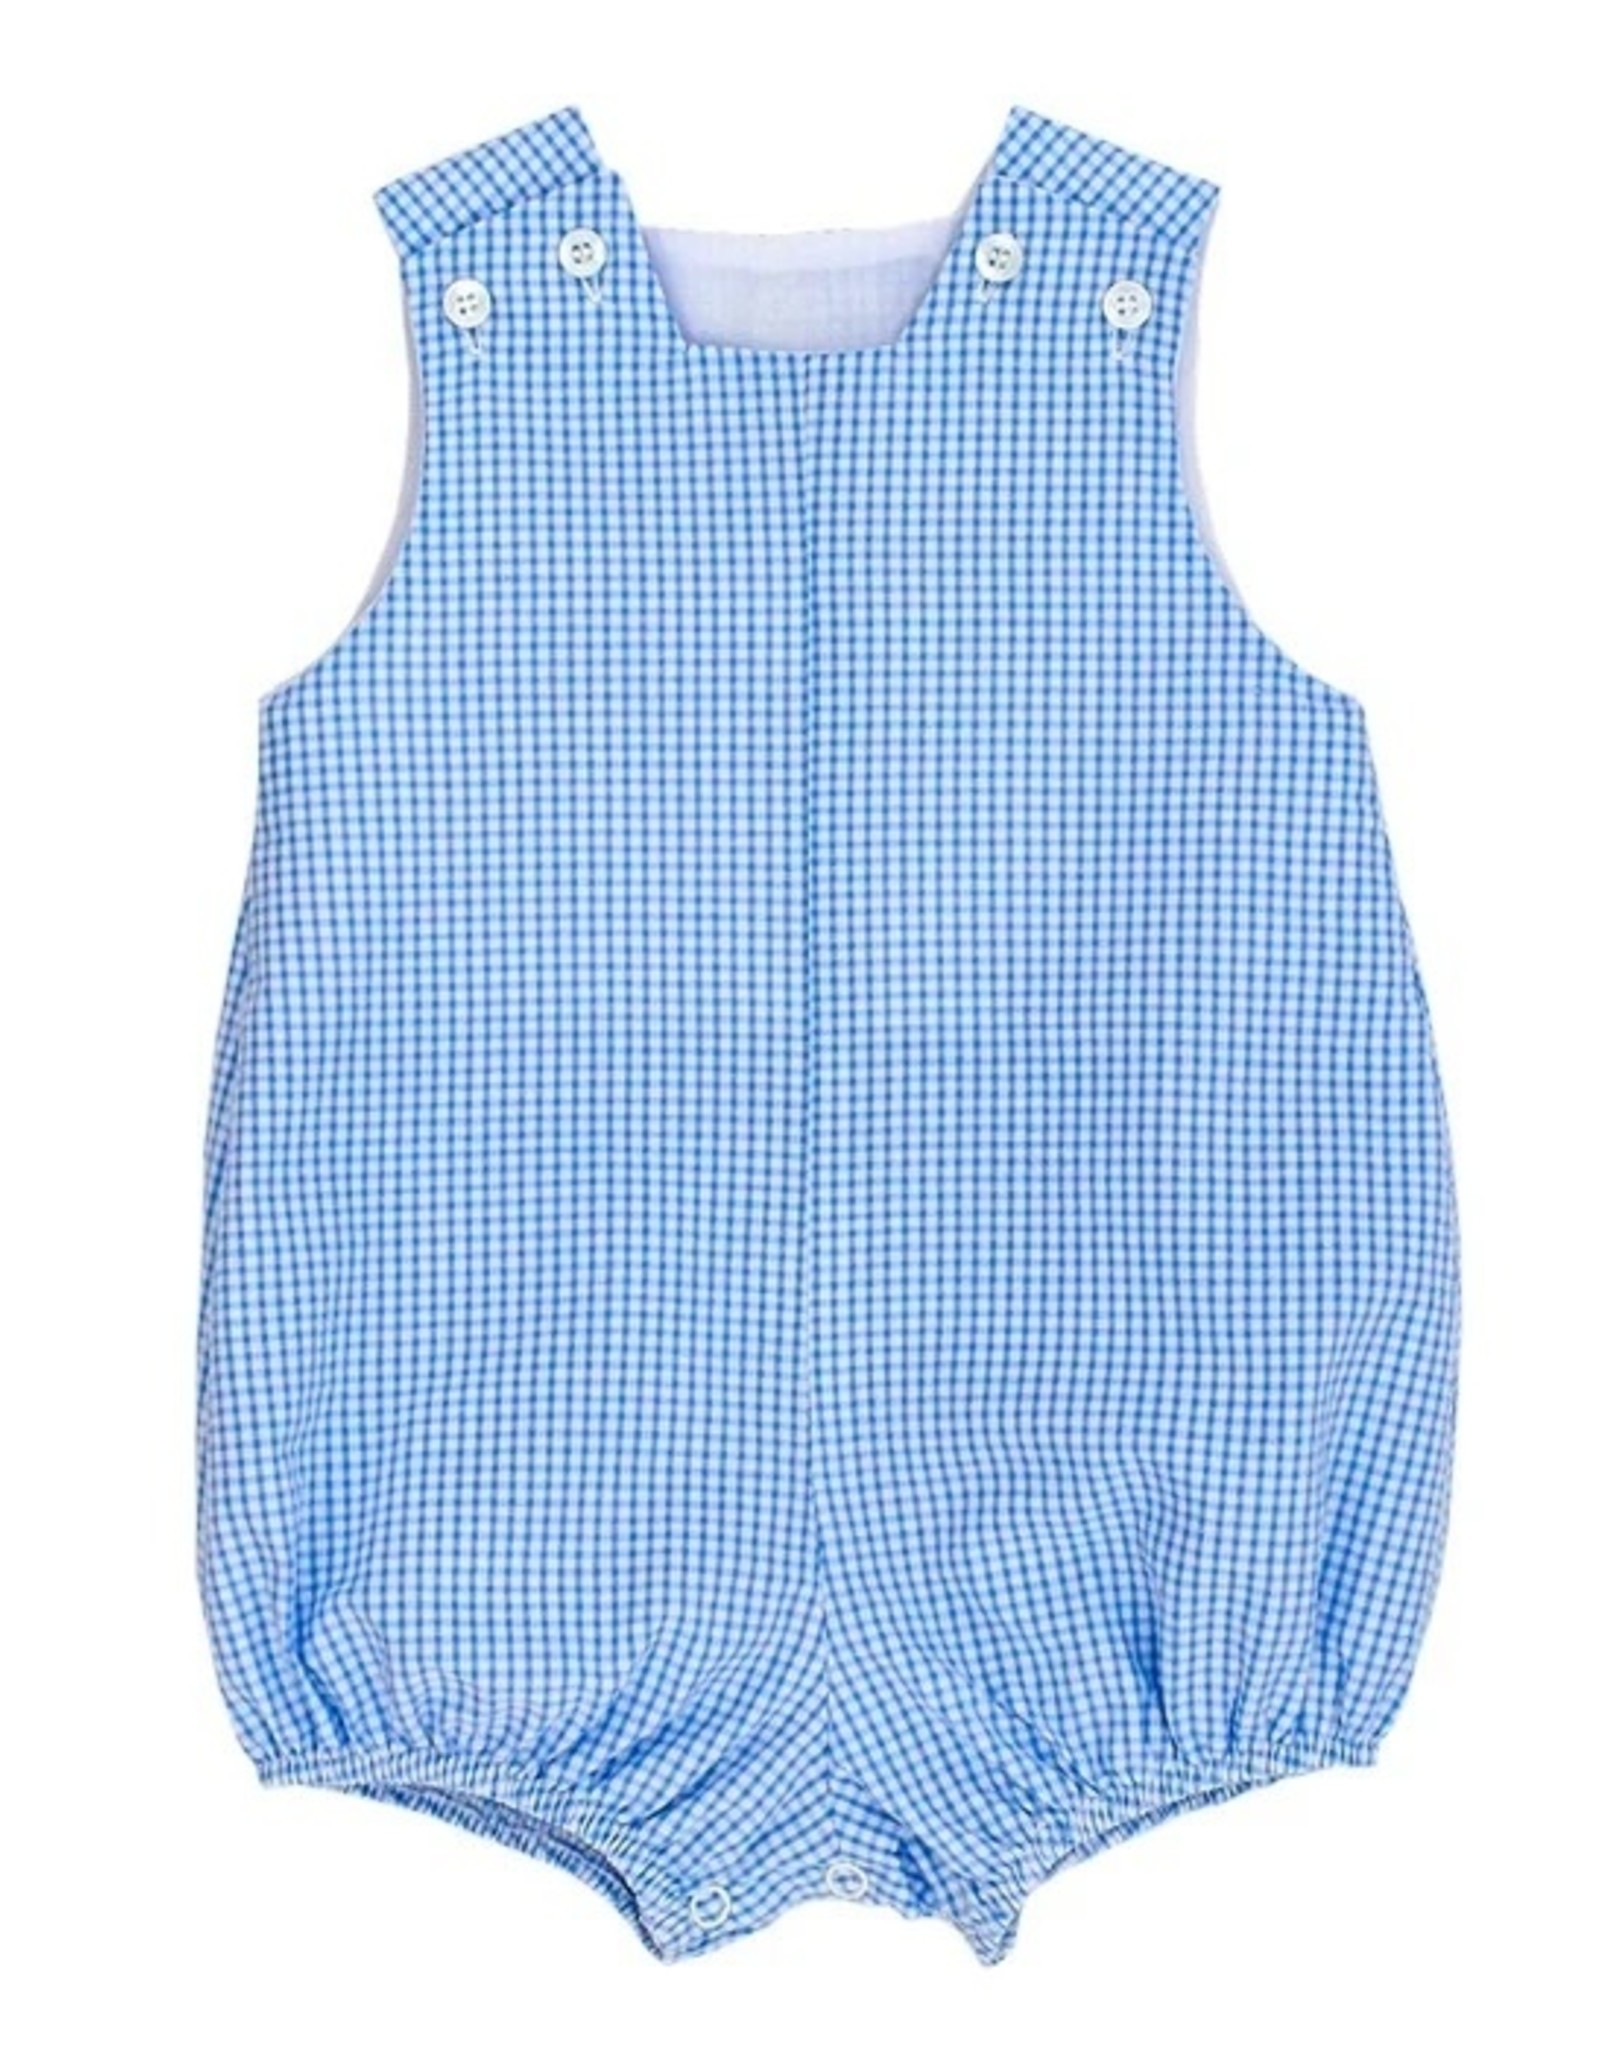 The Bailey Boys Boys Blue Check Seersucker Infant Bubble